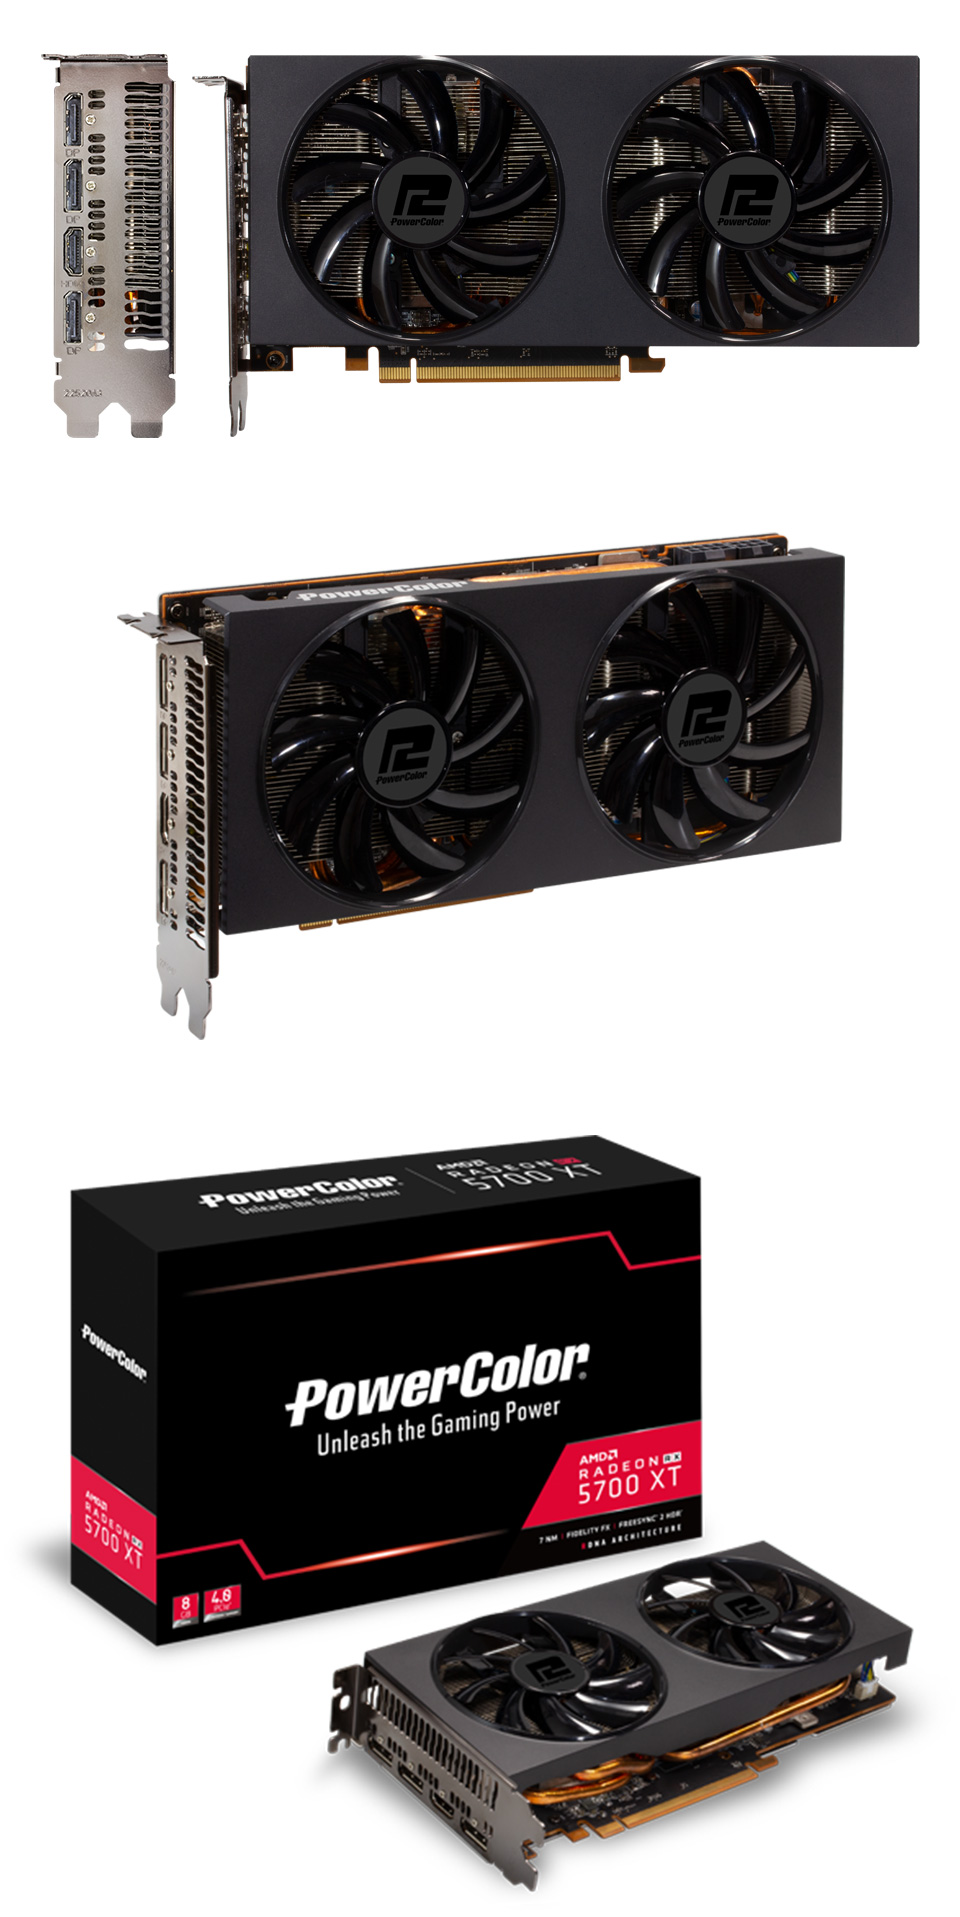 PowerColor Radeon RX 5700 XT 8GB product